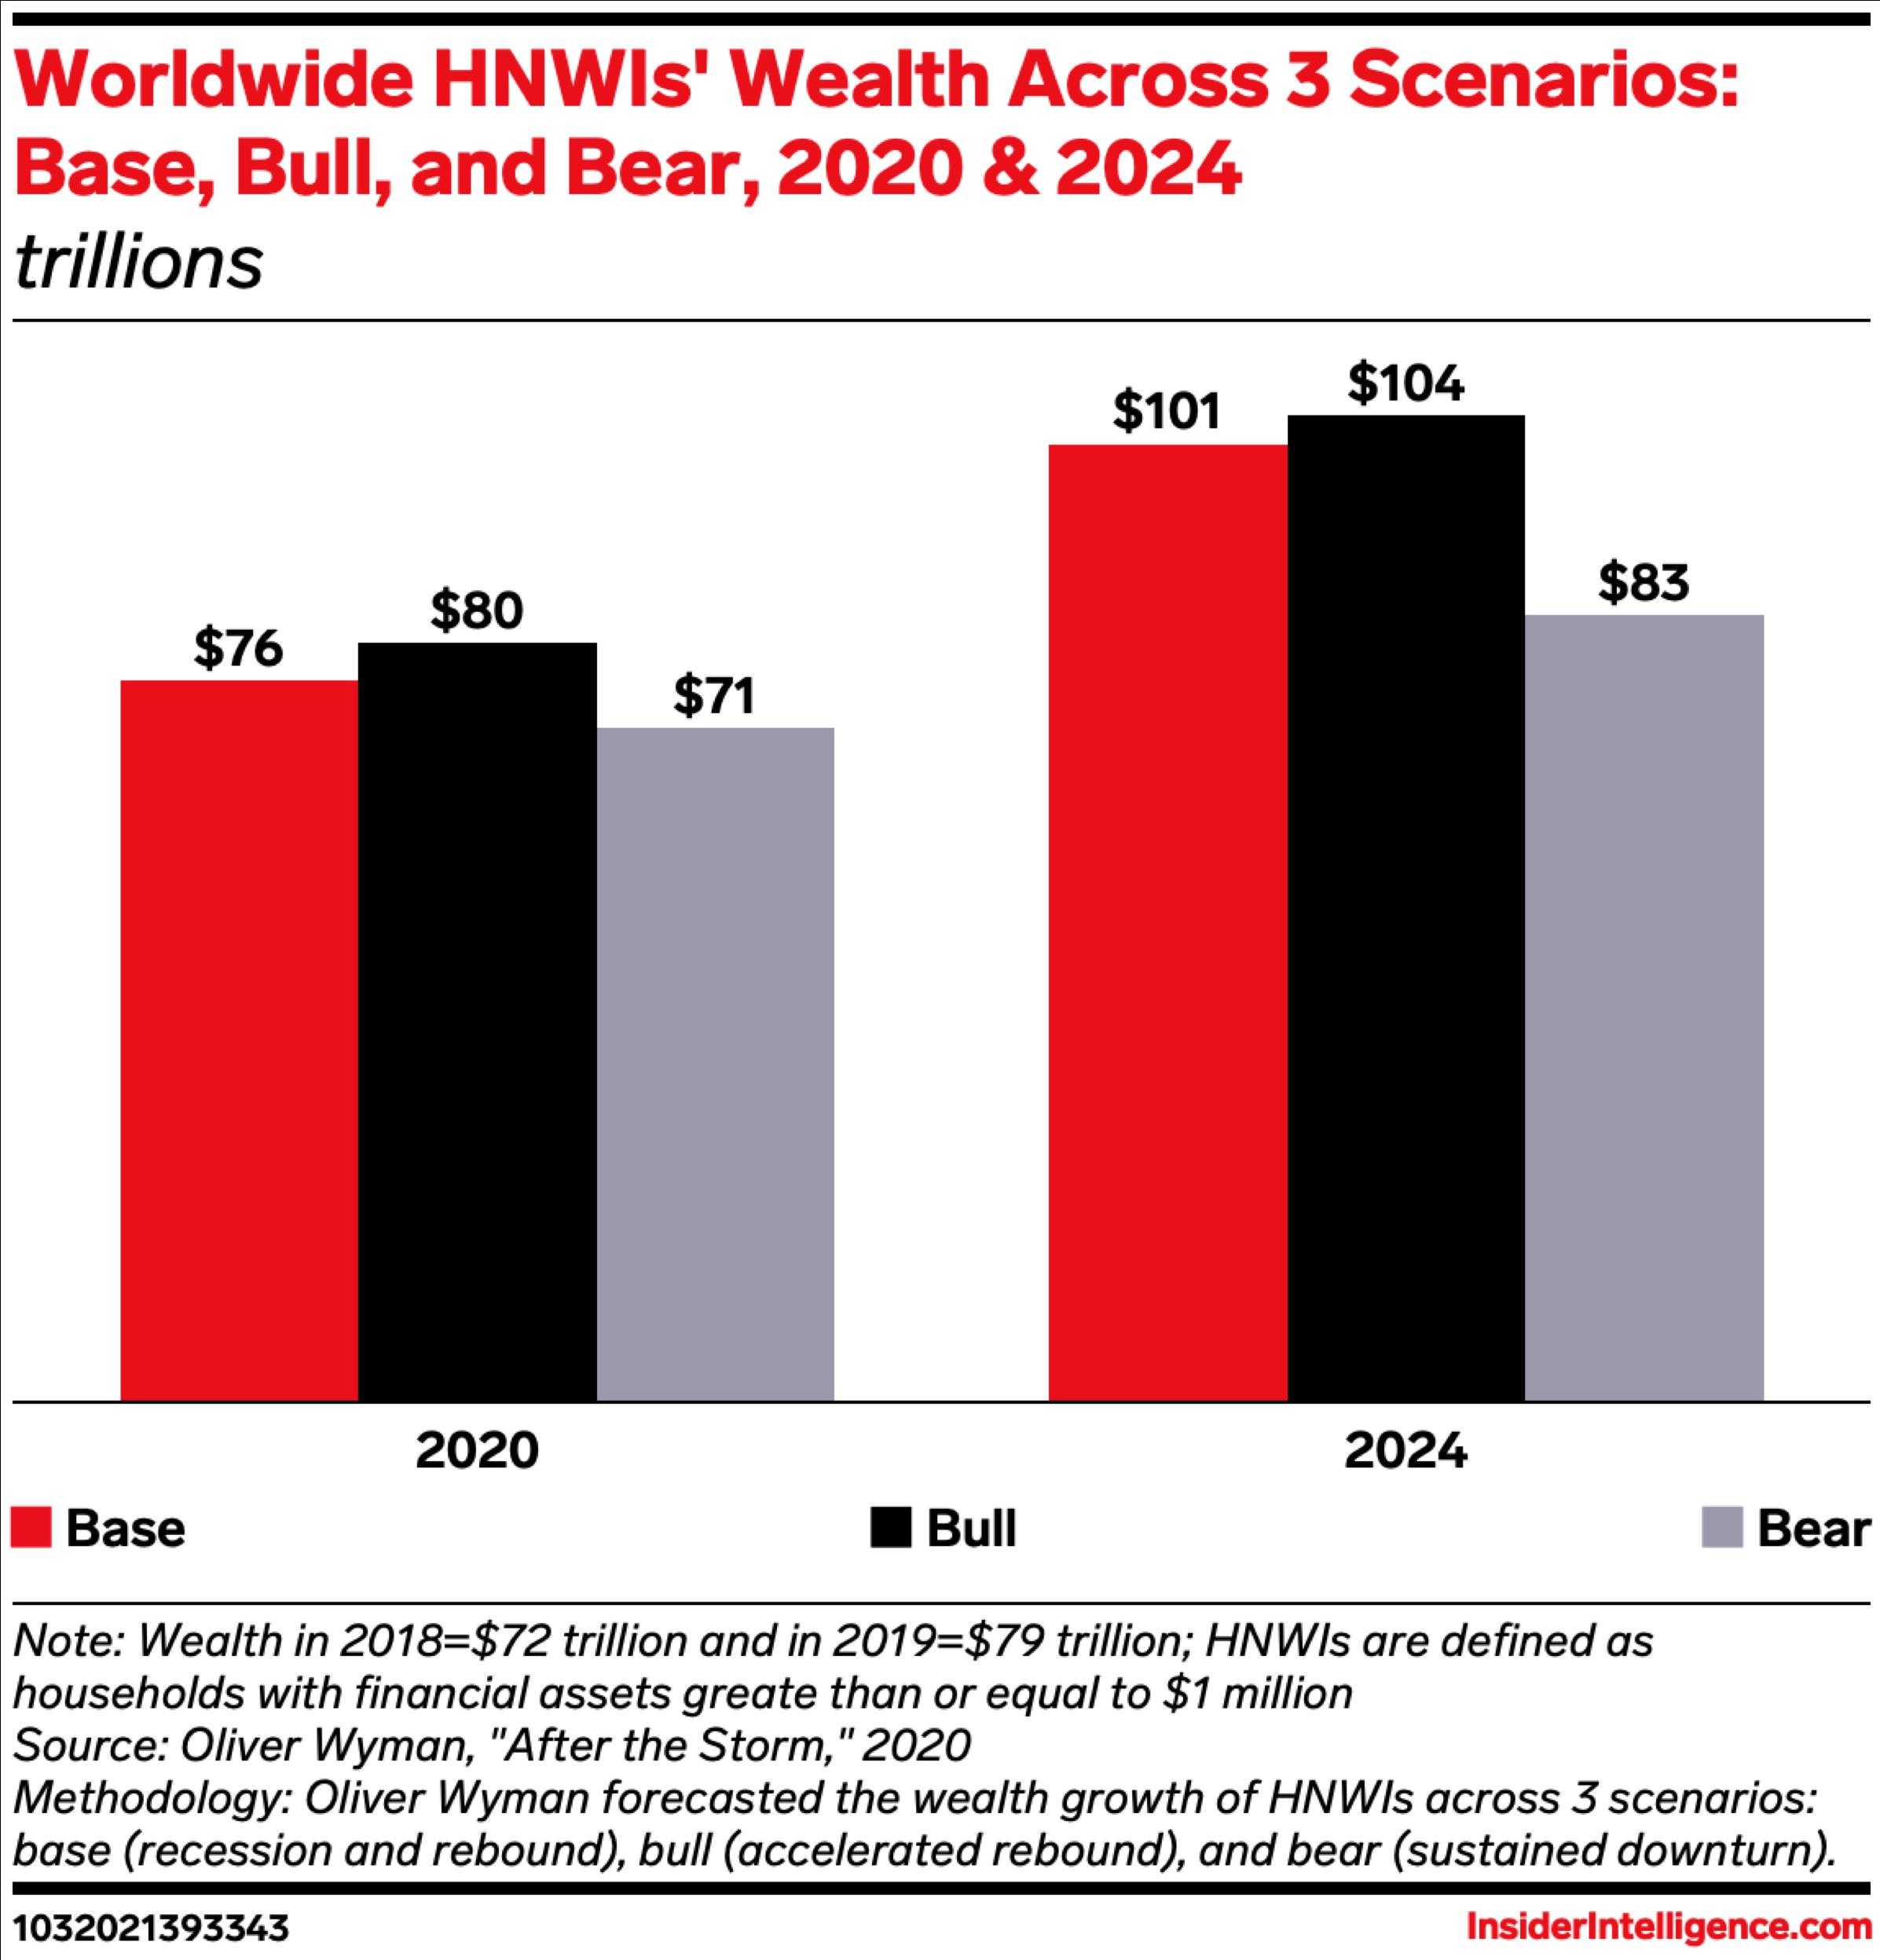 Worldwide HNWIs' Wealth Across 3 Scenarios: Base, Bull, and Bear, 2020 & 2024 (trillions)